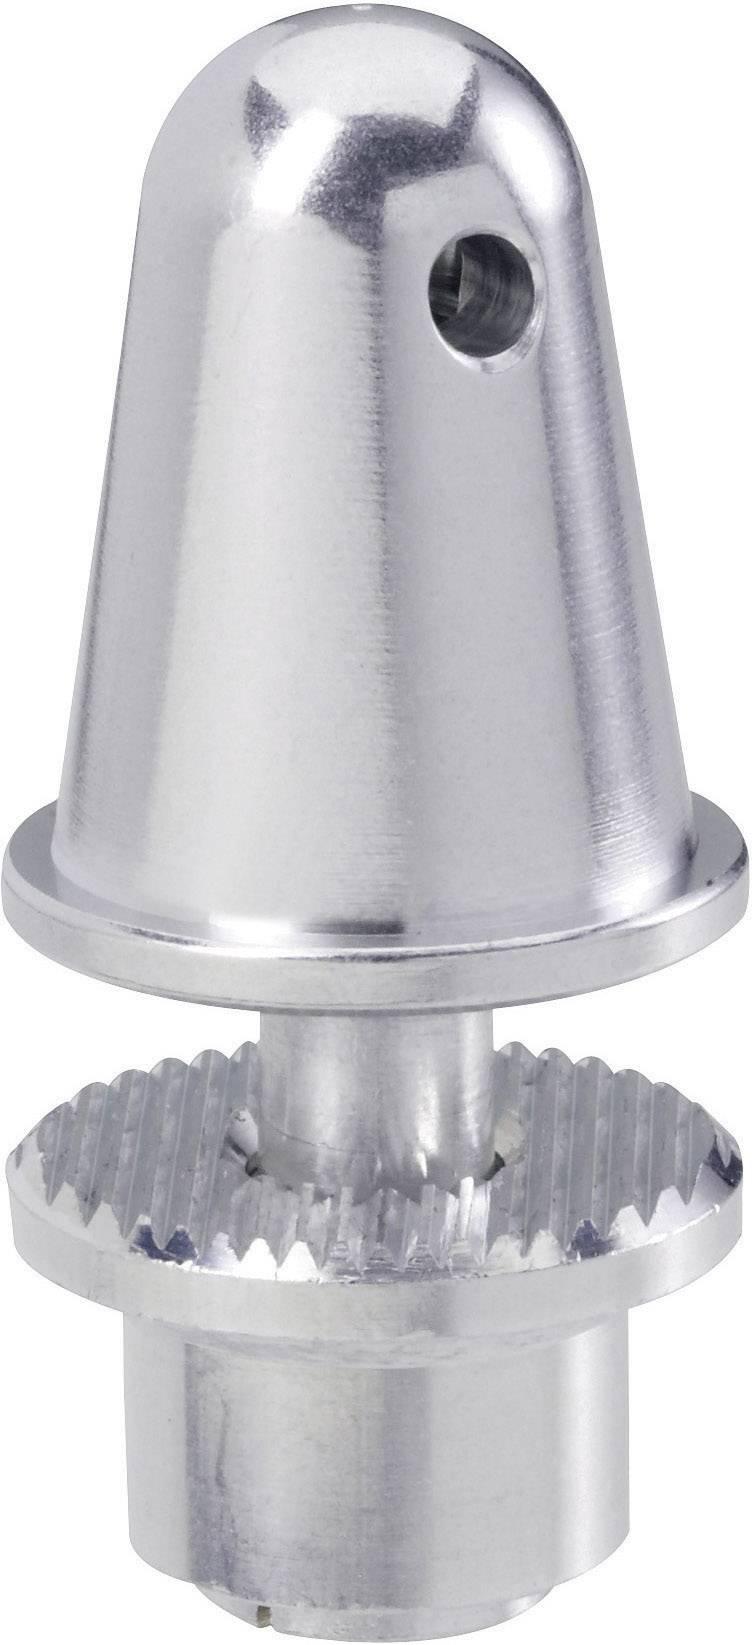 Unašeč vrtule Reely, Ø 16 mm, 3 mm